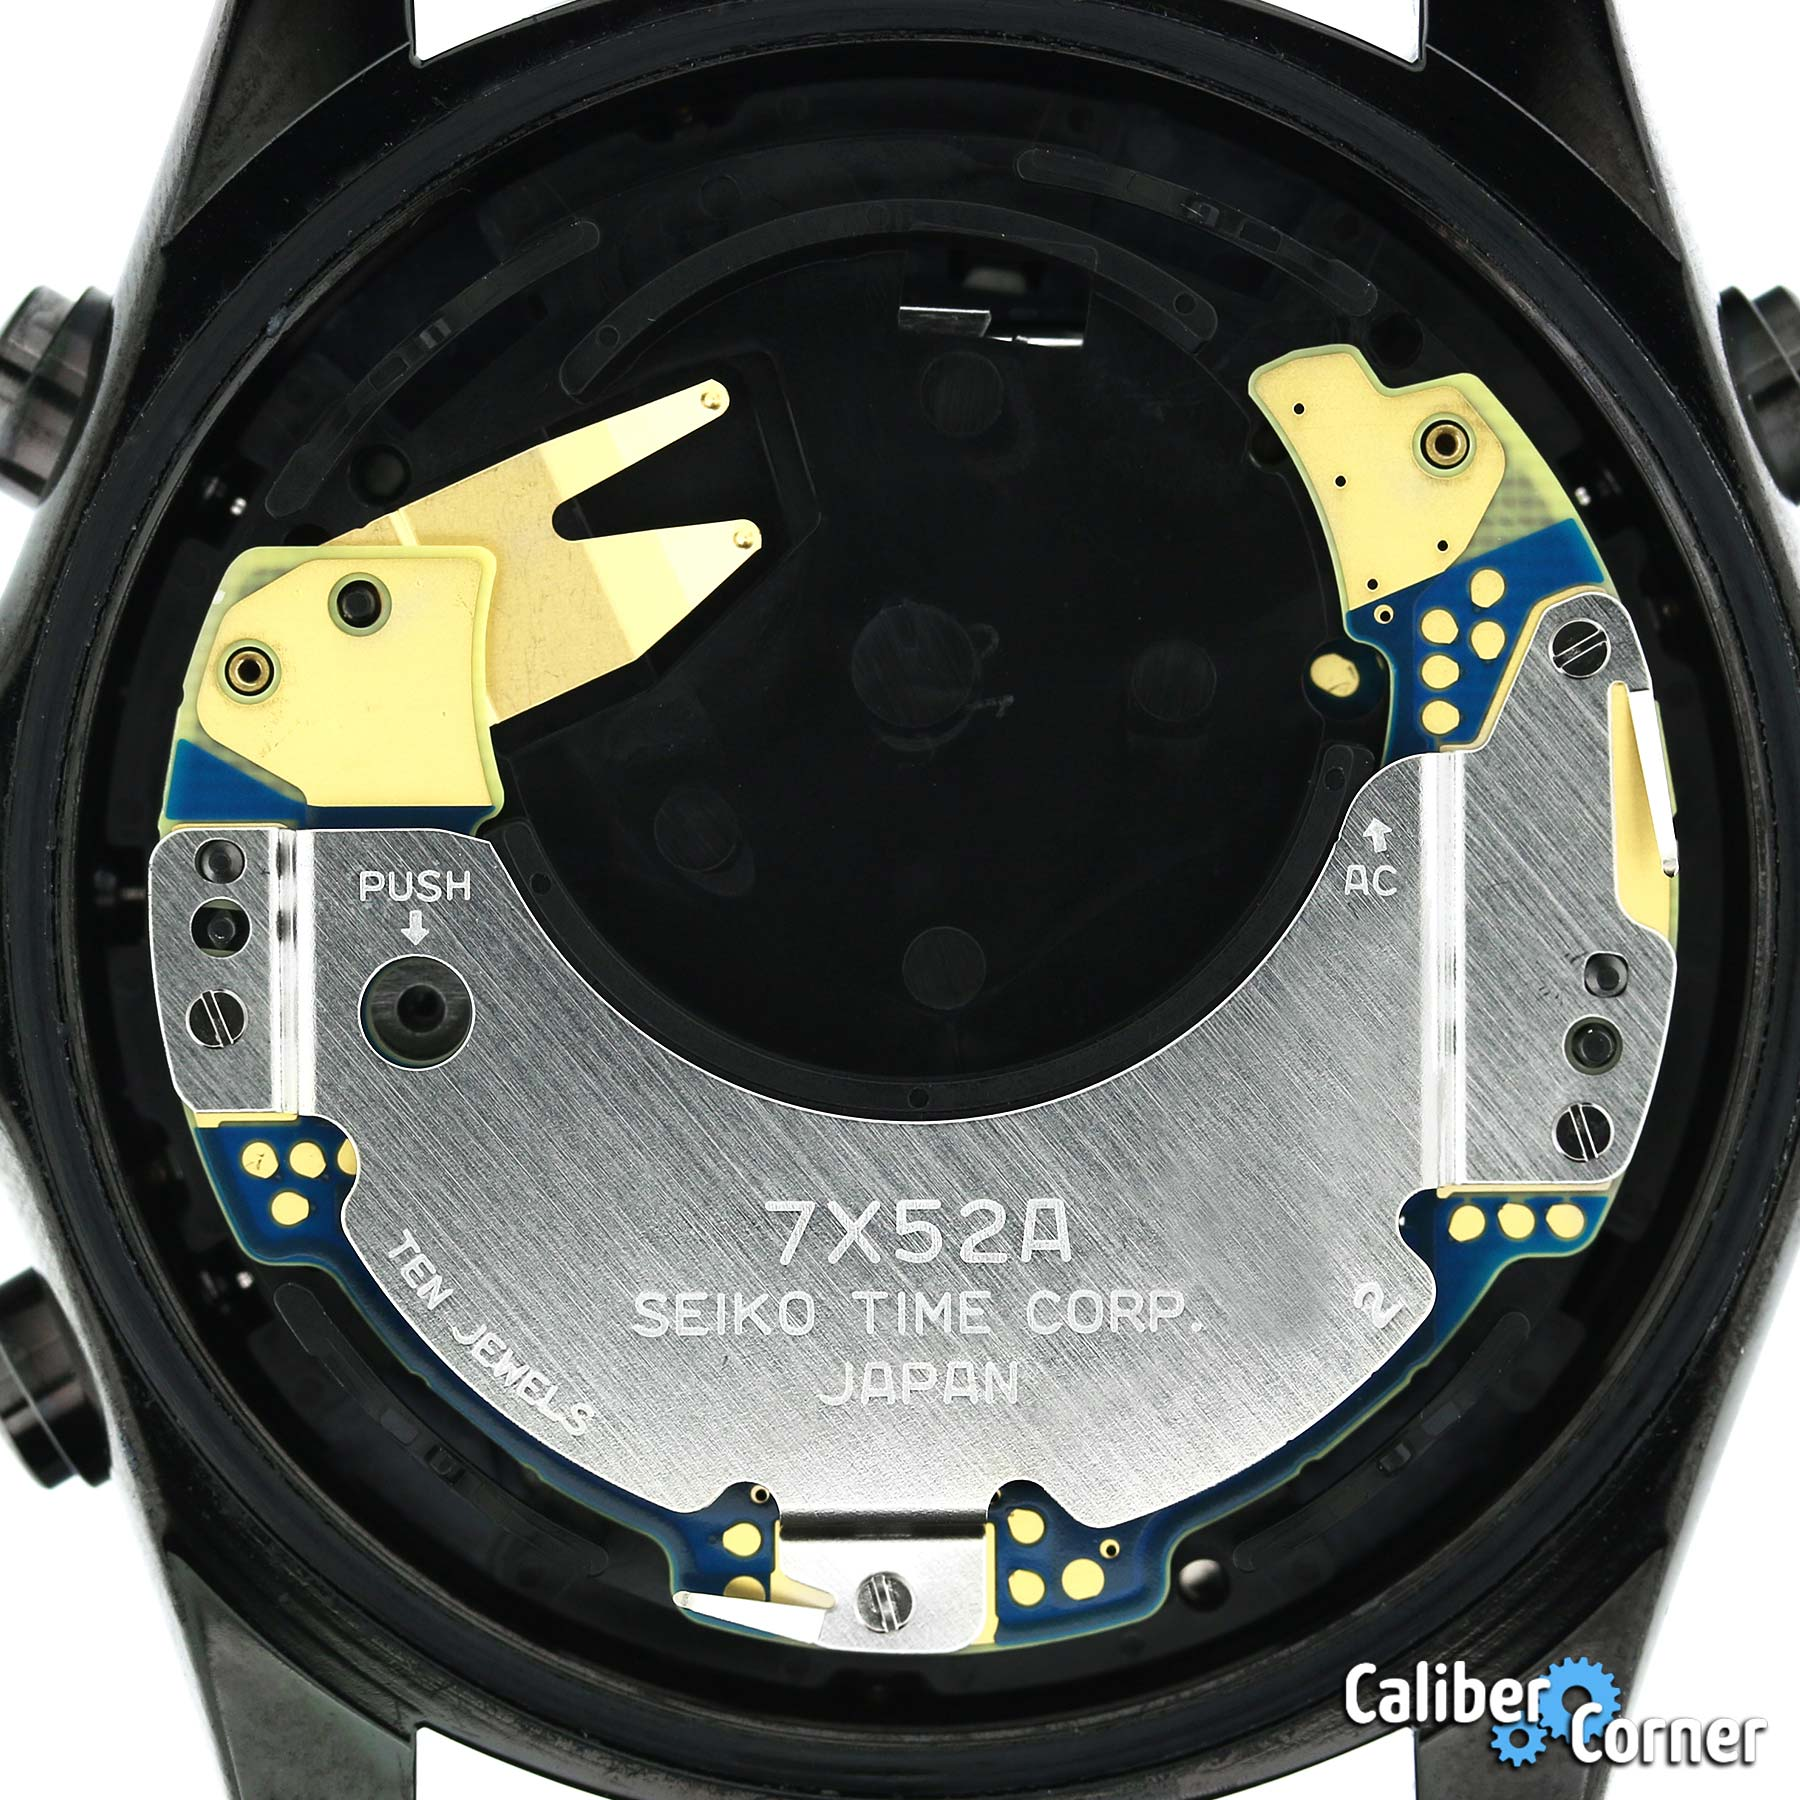 Seiko Caliber 7x52a Battery